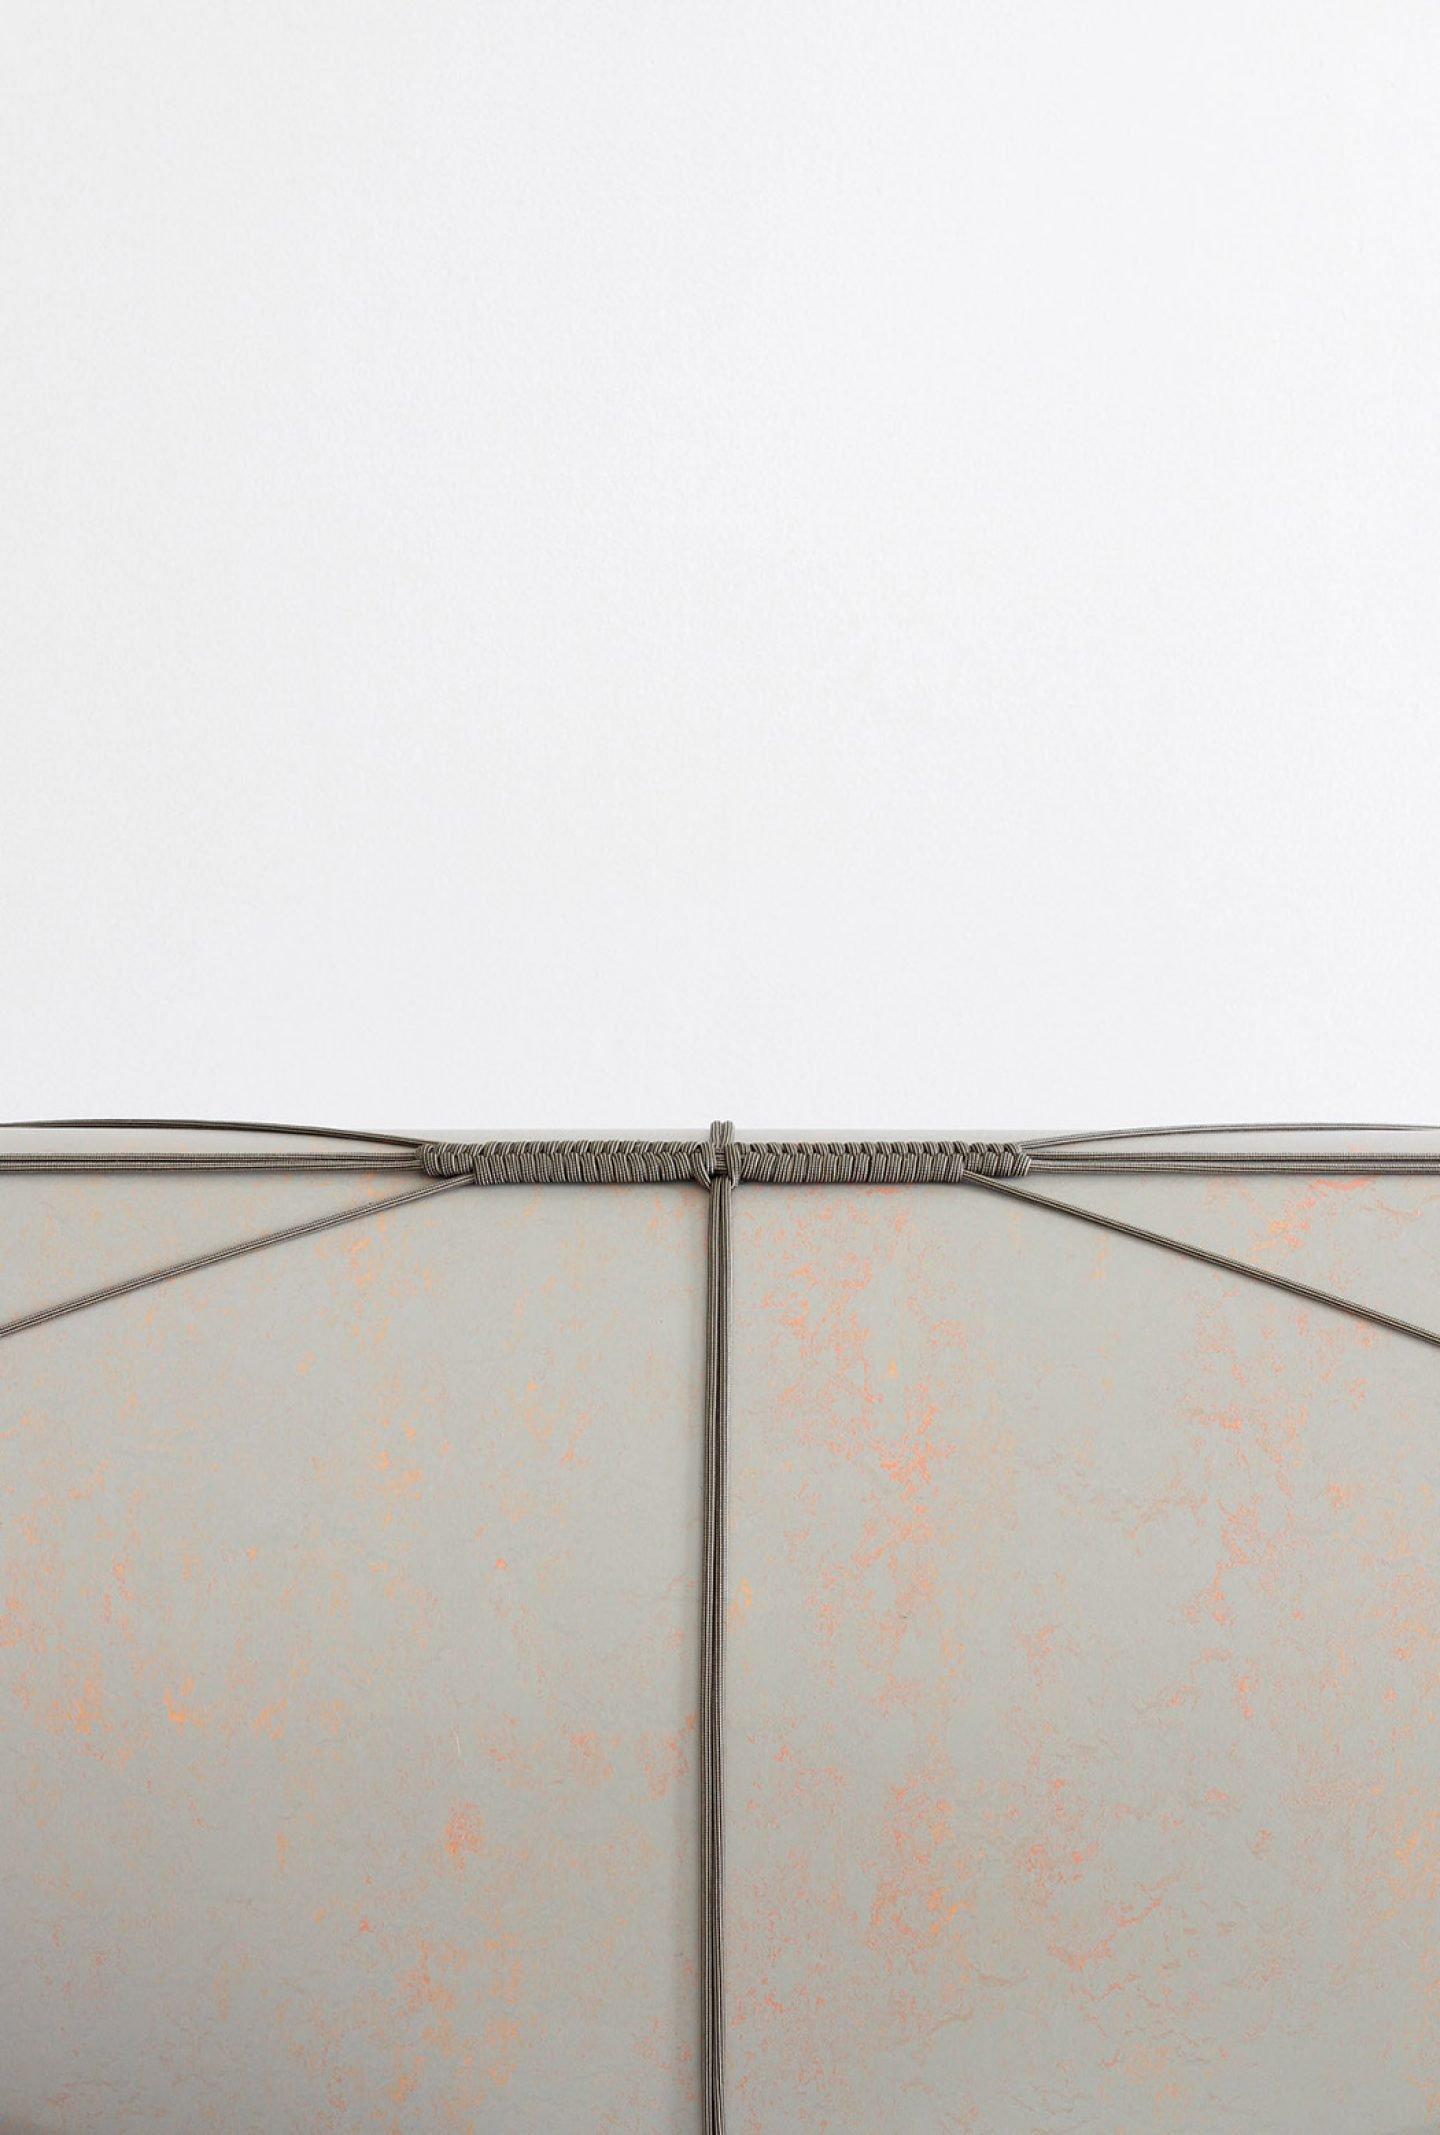 iGNANT_Design_Maarten_Kolk_Guus_Kusters_Bound_Stool_Bound_Bench_5